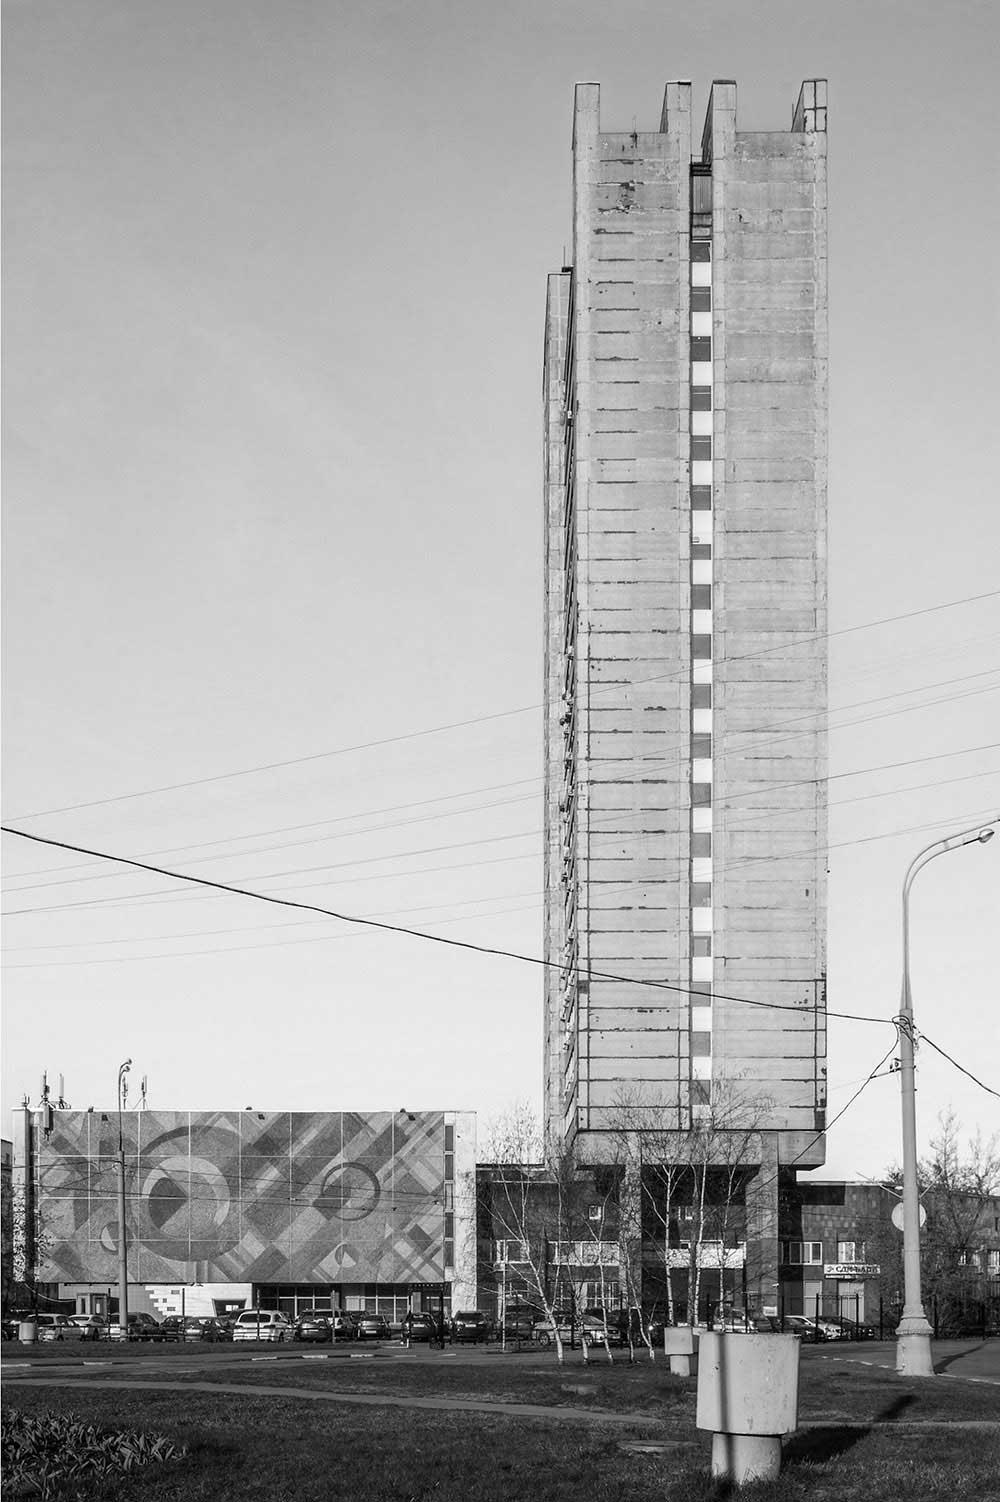 esakov_notower_06